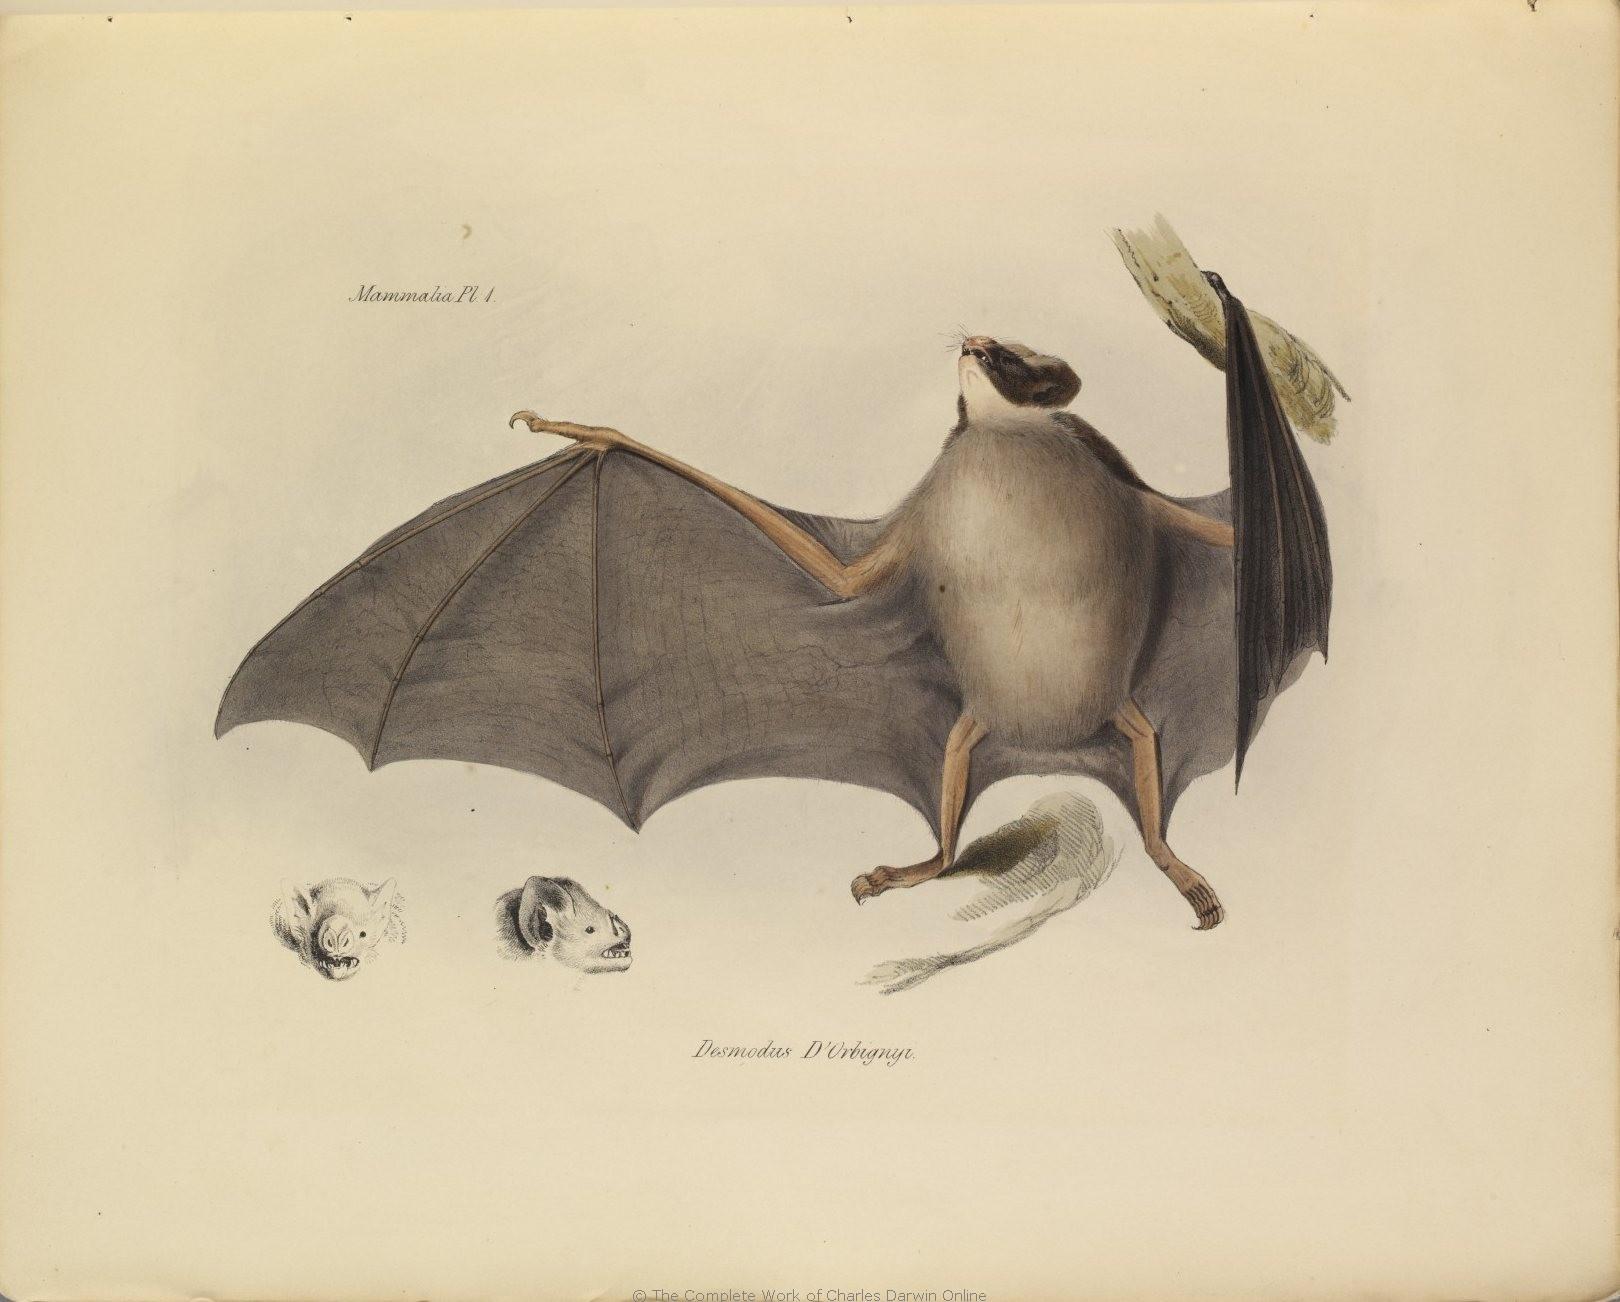 1838_Zoology_F8.2_023.jpg